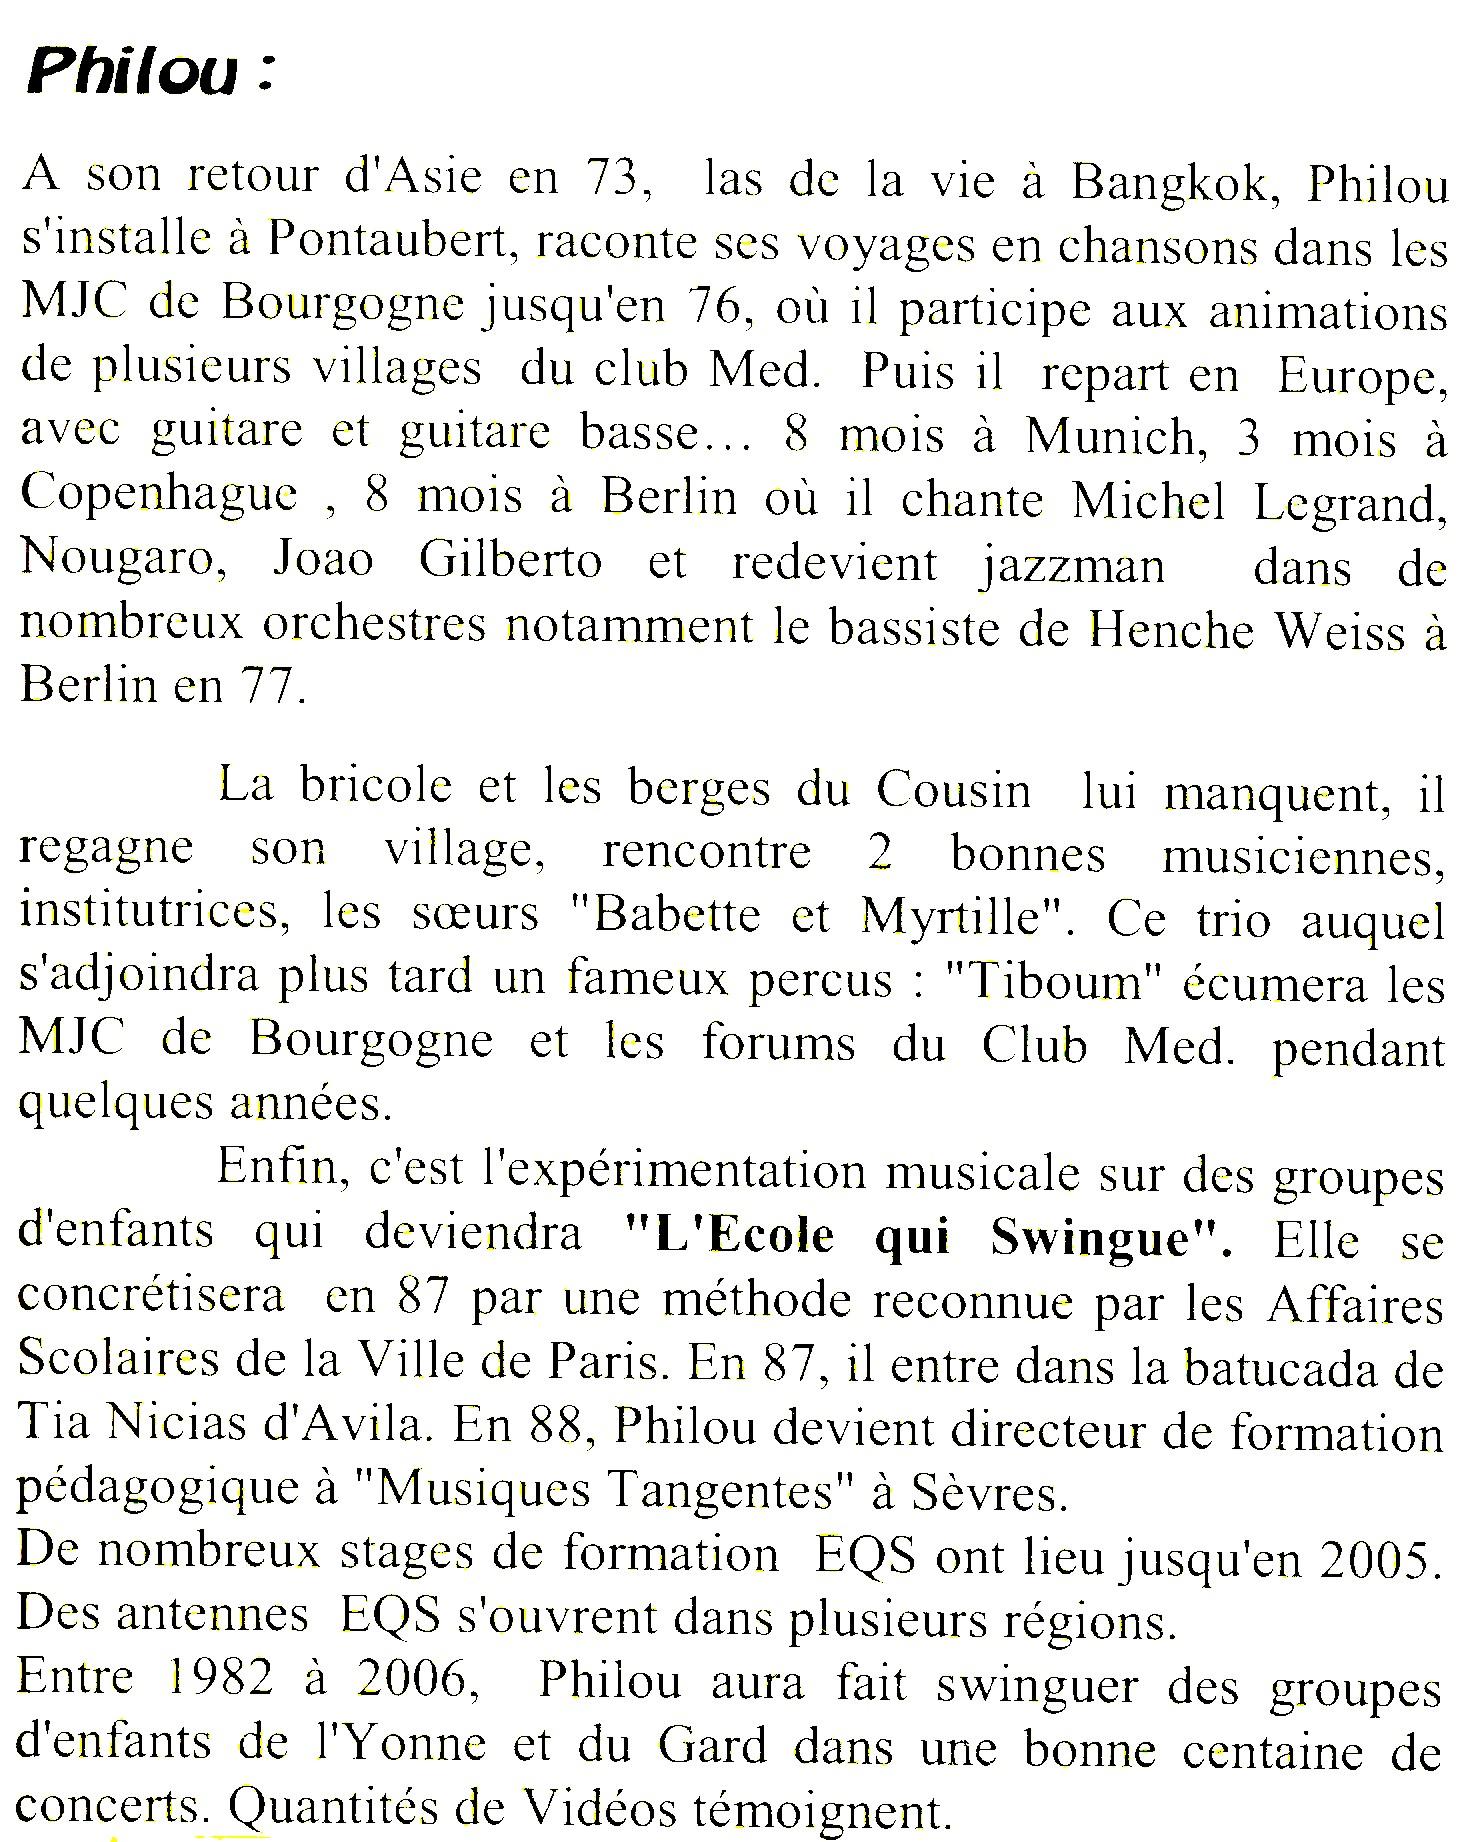 Texte philou 2